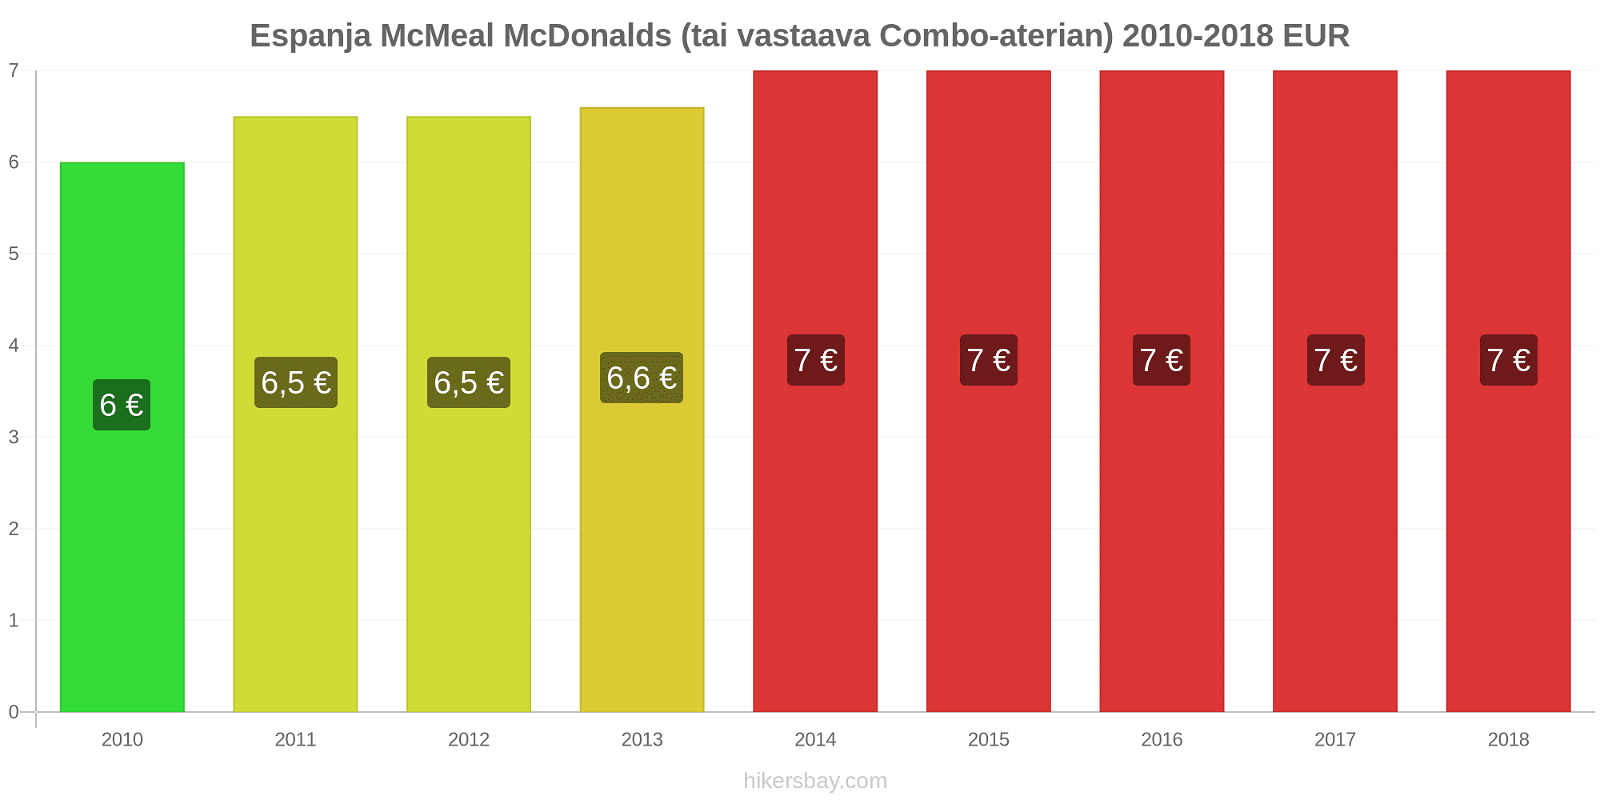 Espanja hintojen muutokset McMeal McDonalds (tai vastaava Combo-aterian) hikersbay.com